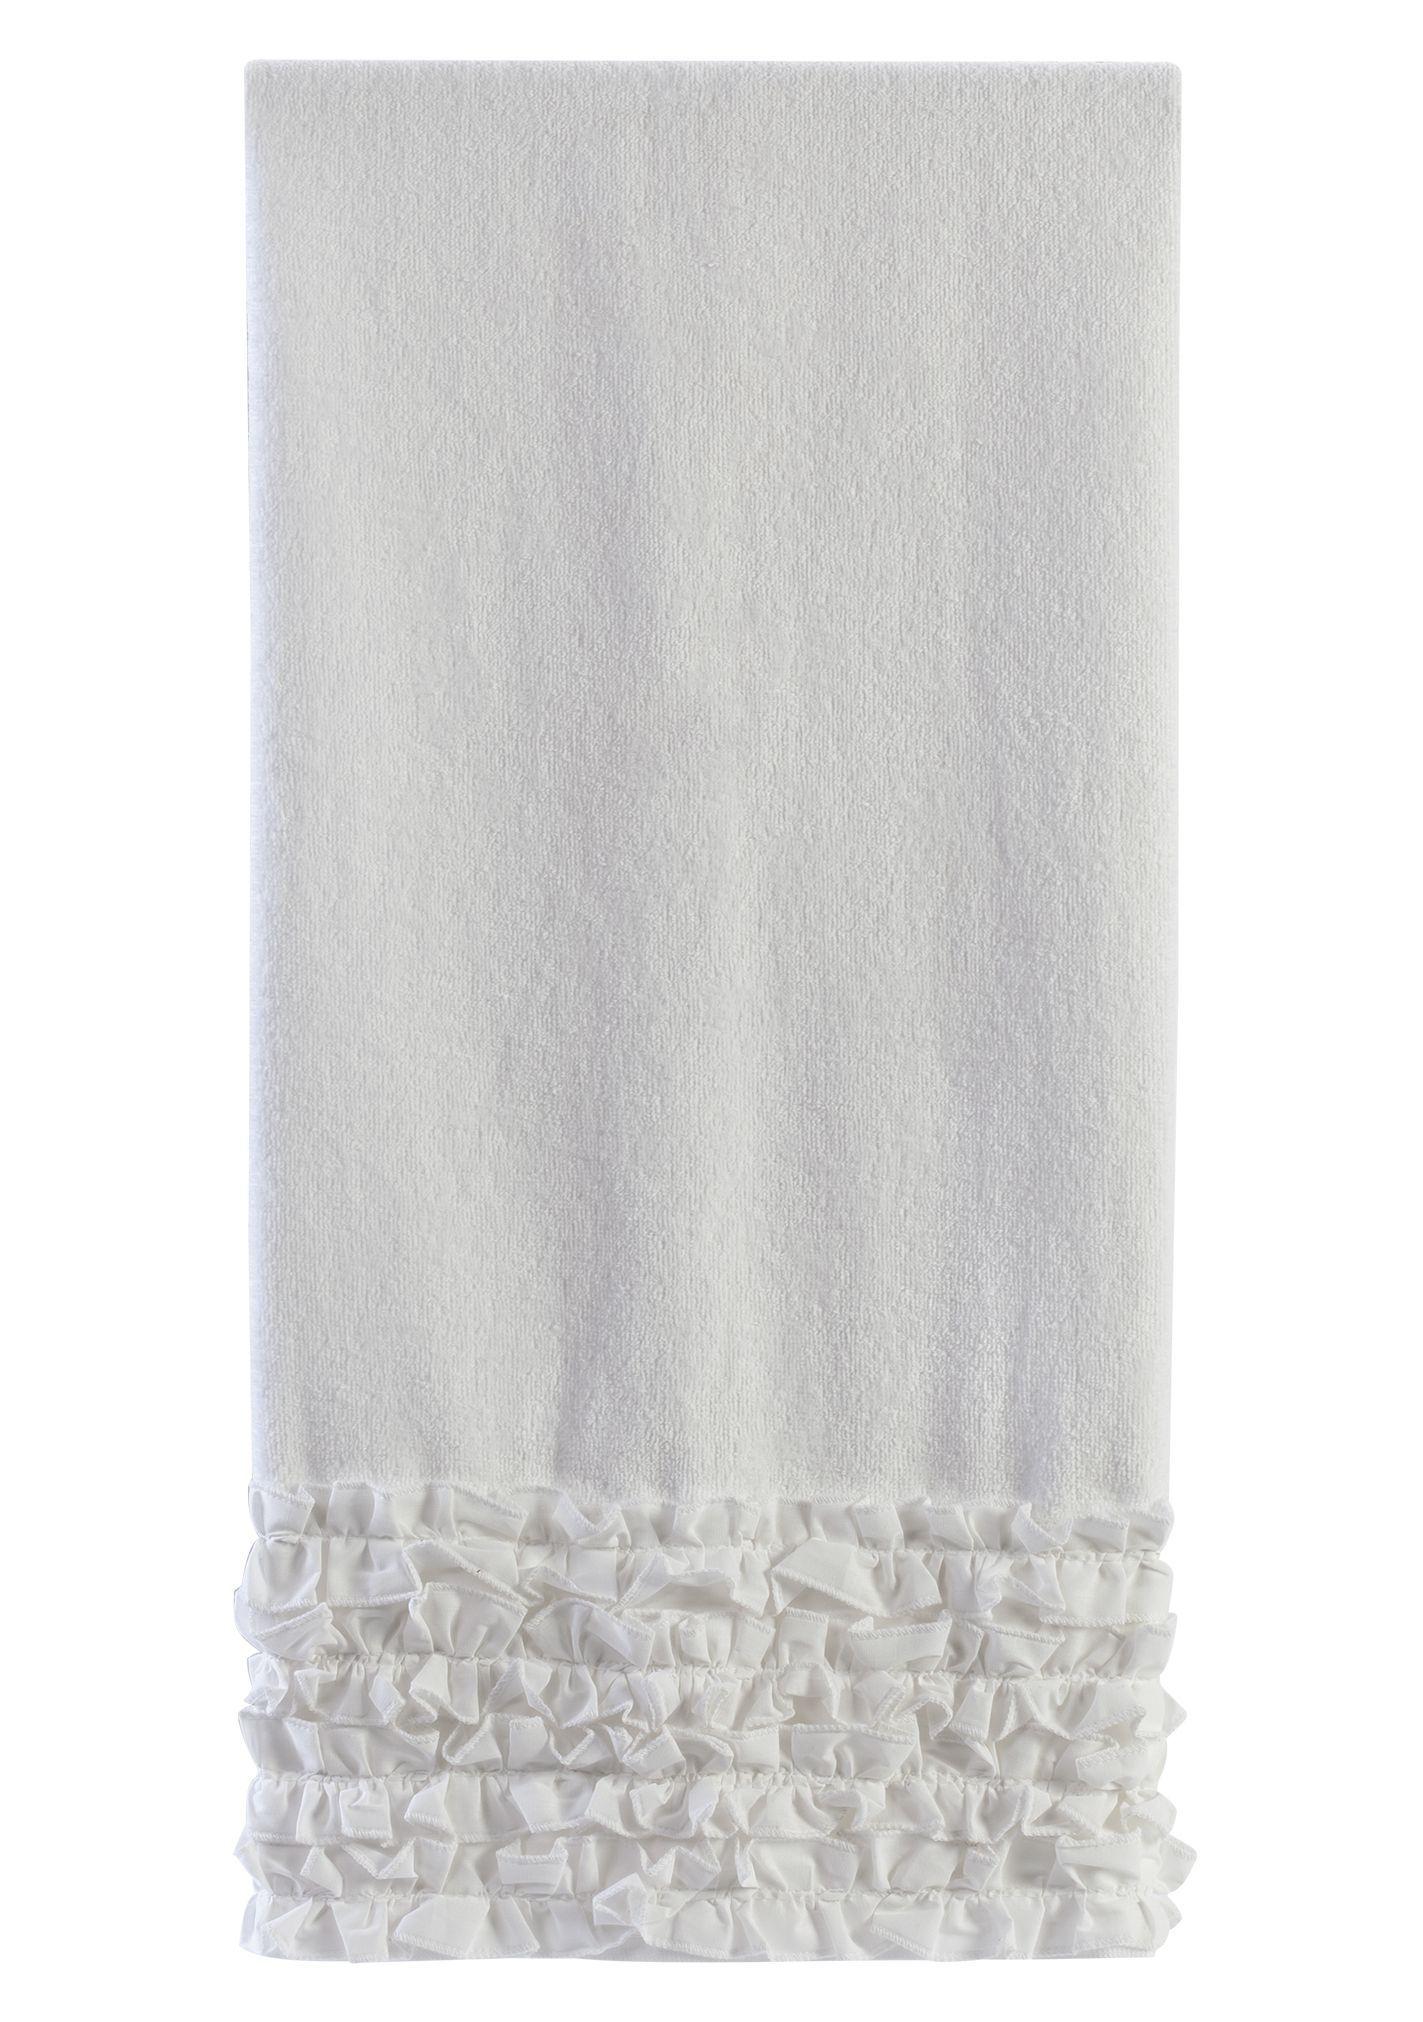 Полотенца Полотенце 64х127 Creative Bath Ruffles белое polotentse-mahrovoe-64h127-creative-bath-ruffles-ssha-indiya.jpg